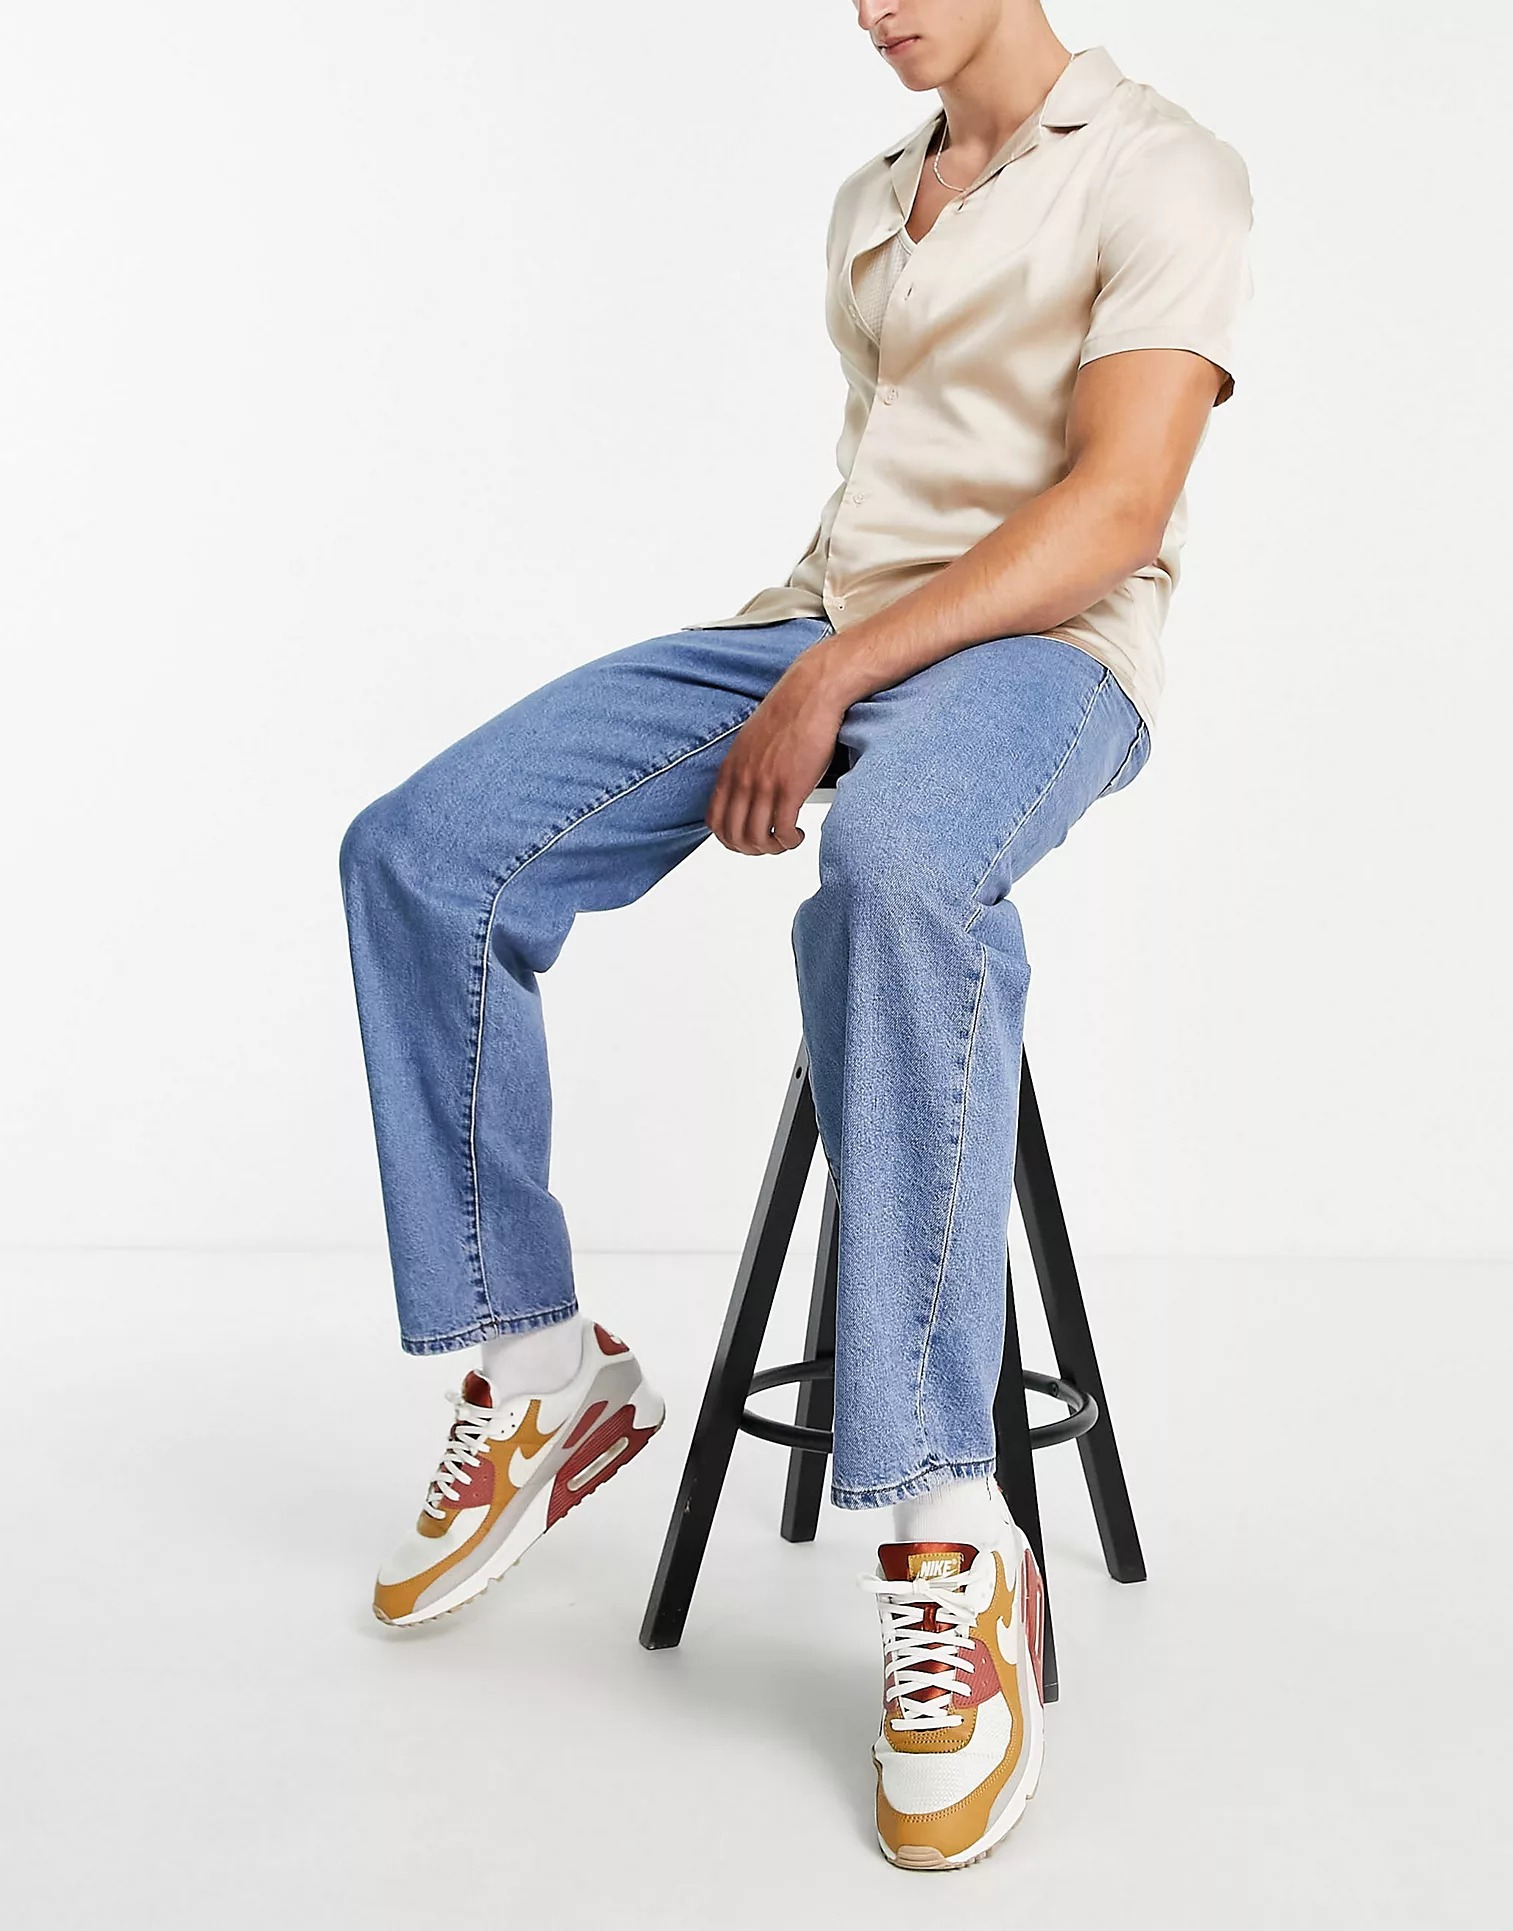 ASOS DESIGN Baggy Jeans